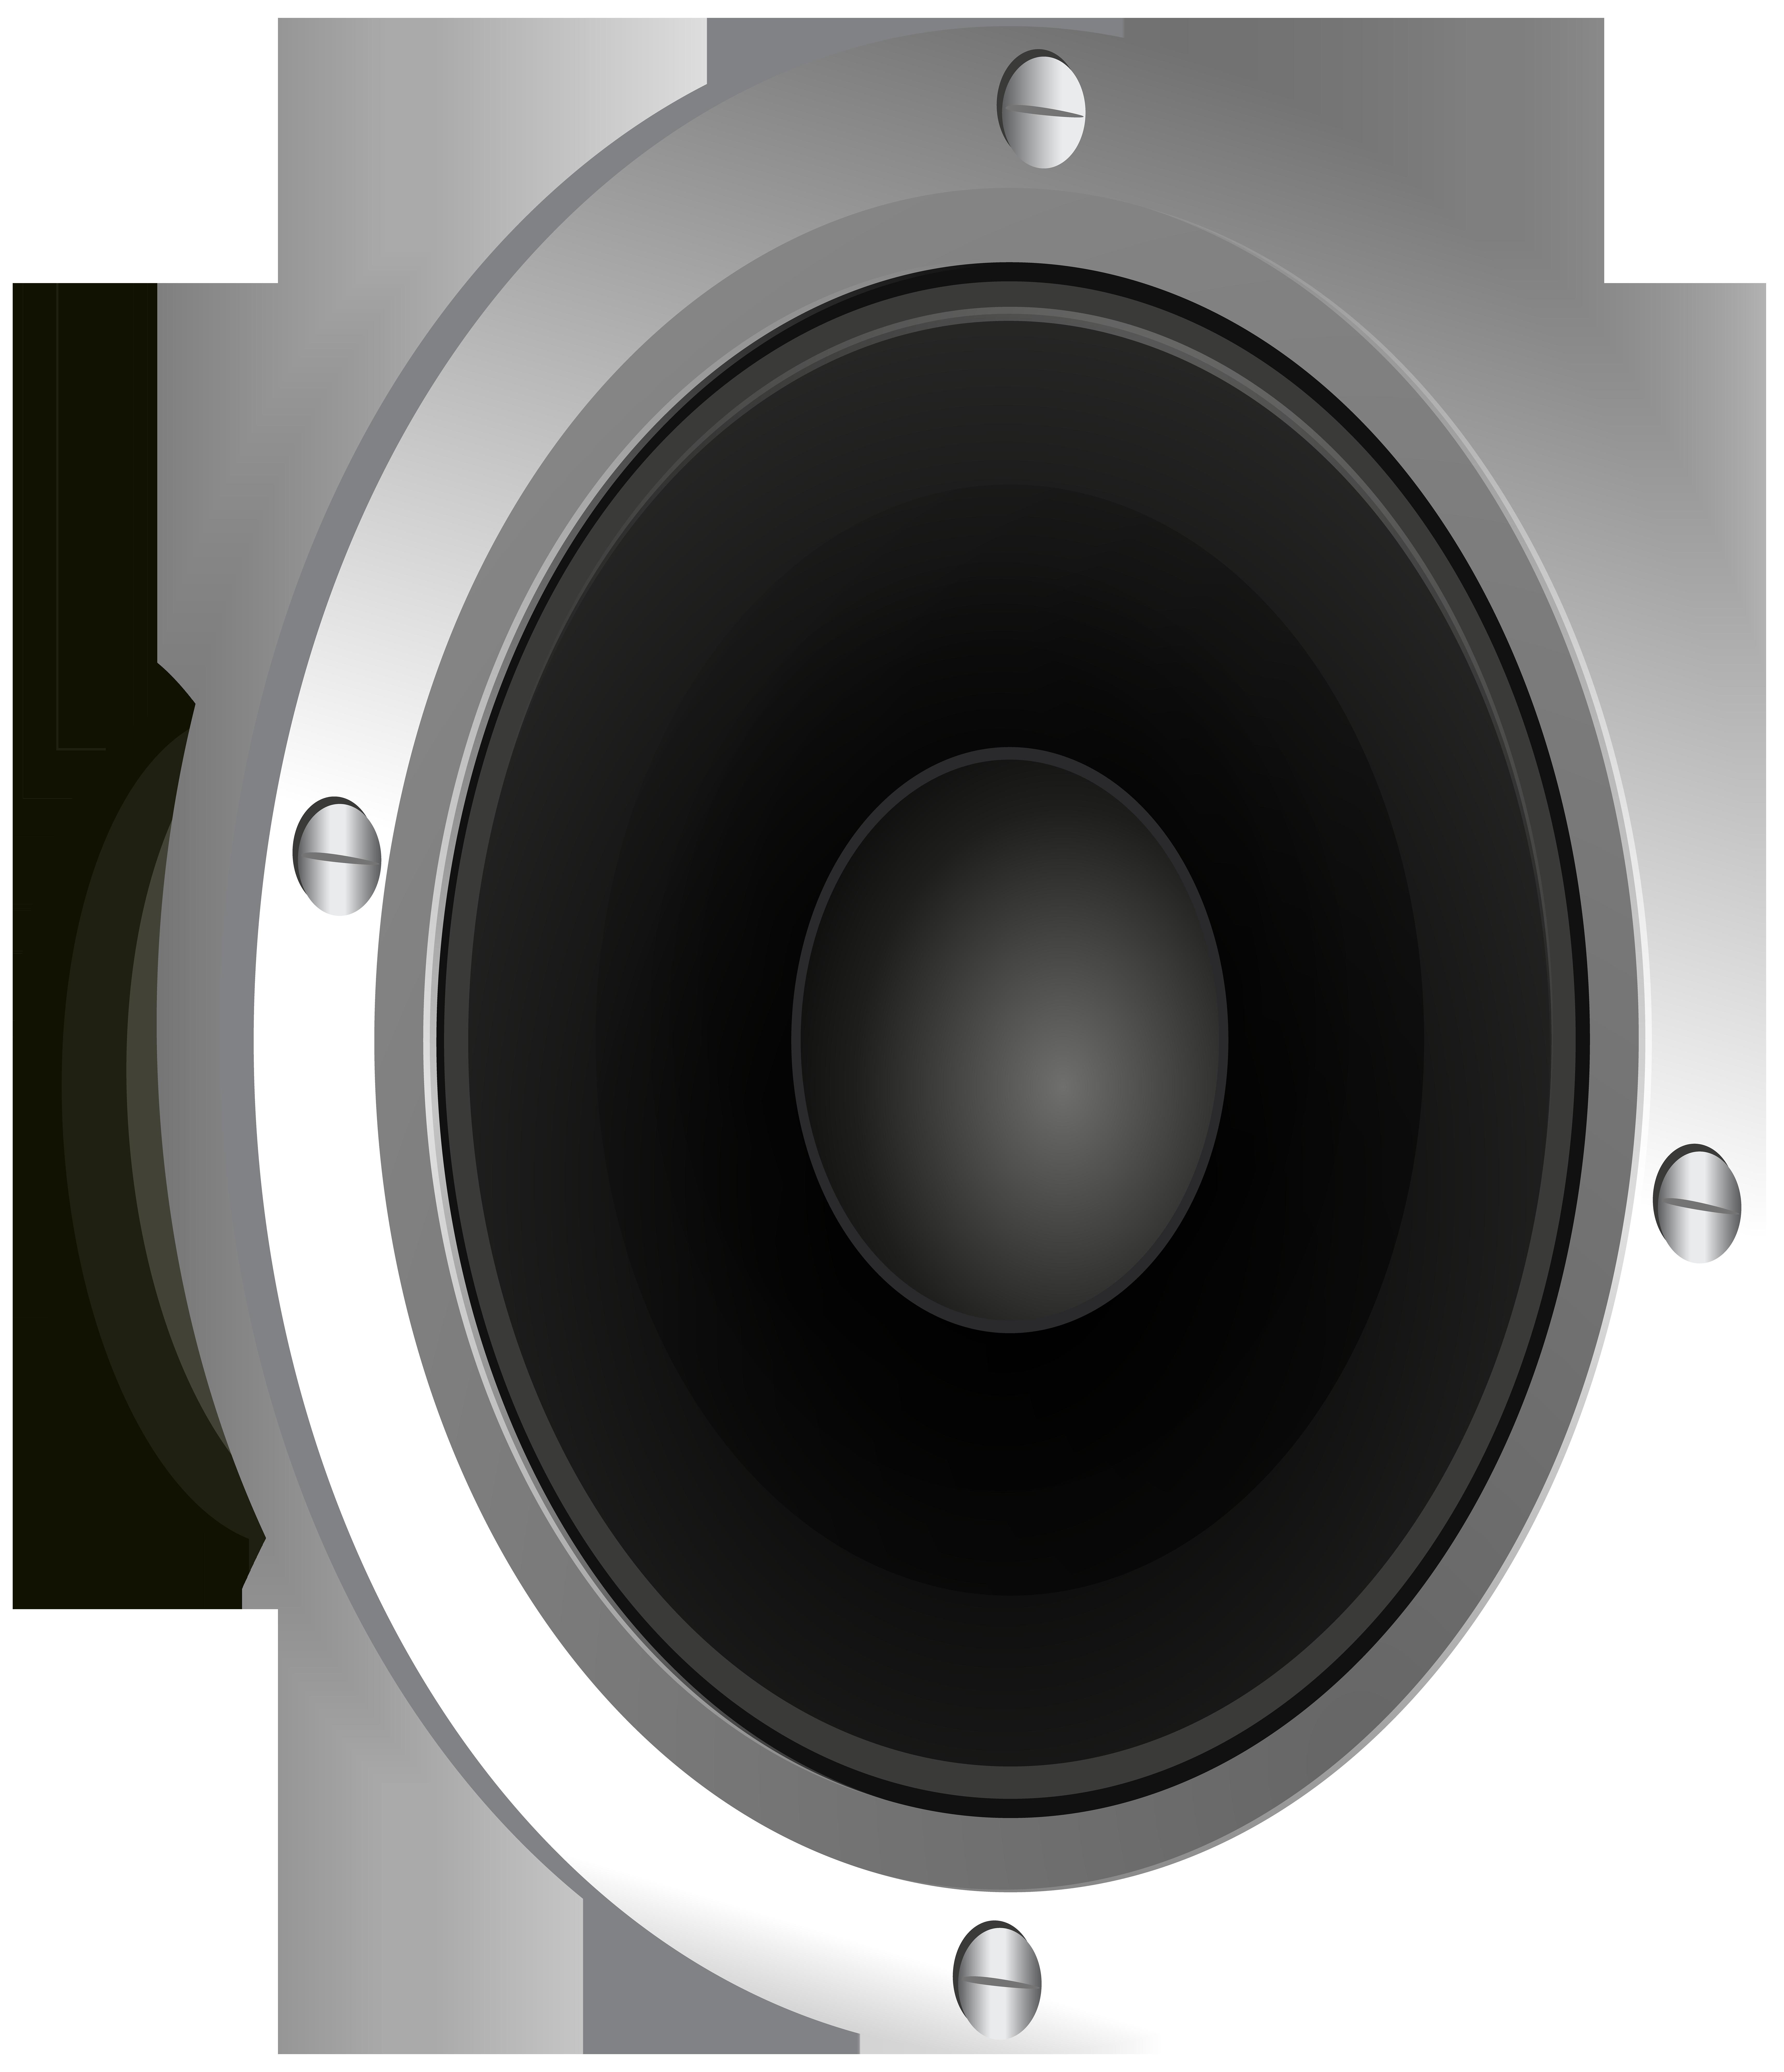 Car speaker clipart vector freeuse library Computer speakers Microphone Clip art - Speaker PNG Clip Art 6887 ... vector freeuse library